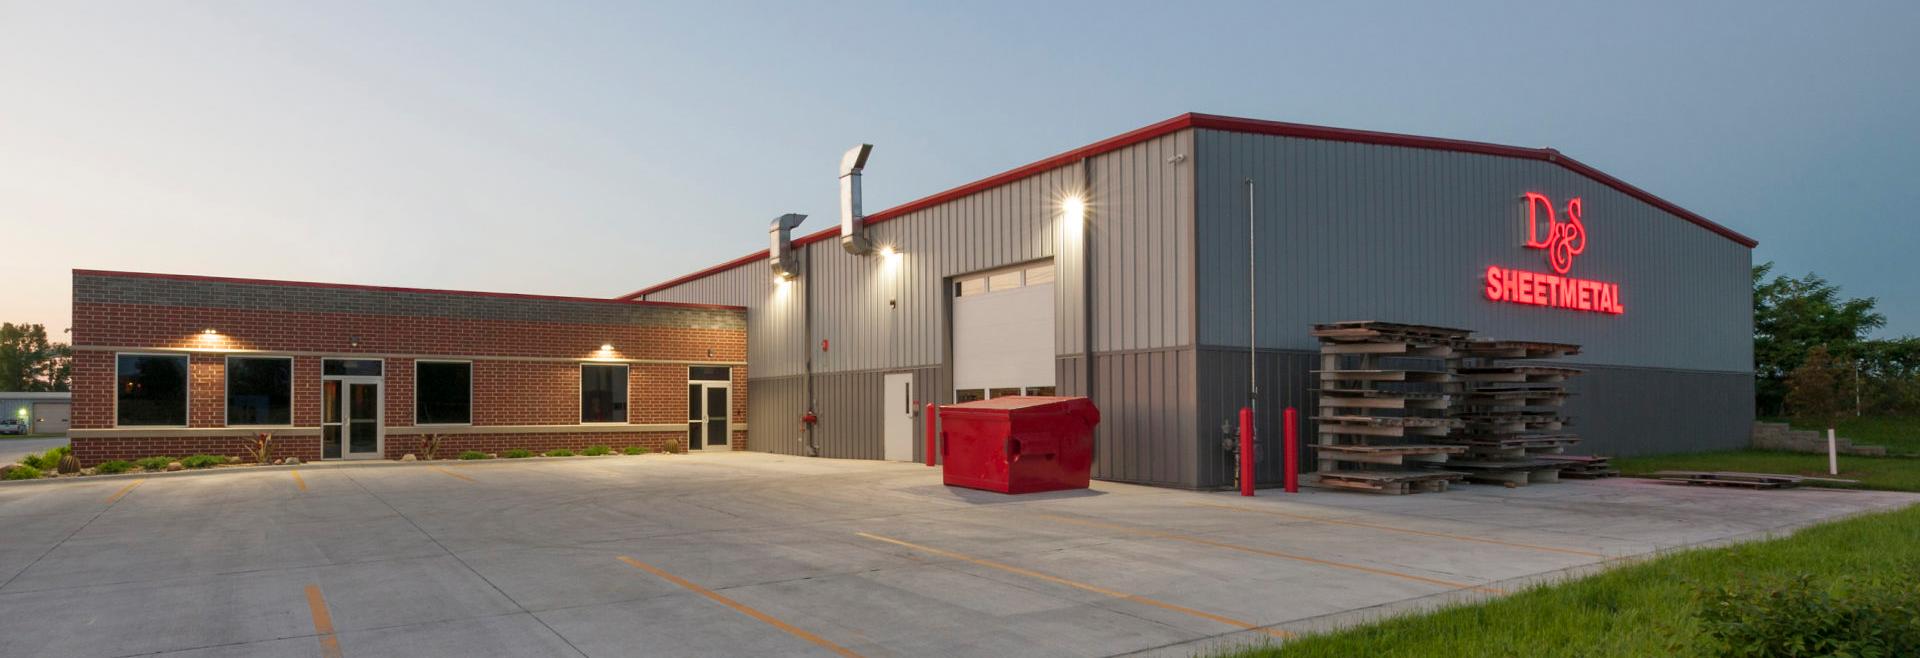 D&S Sheetmetal Warehouse